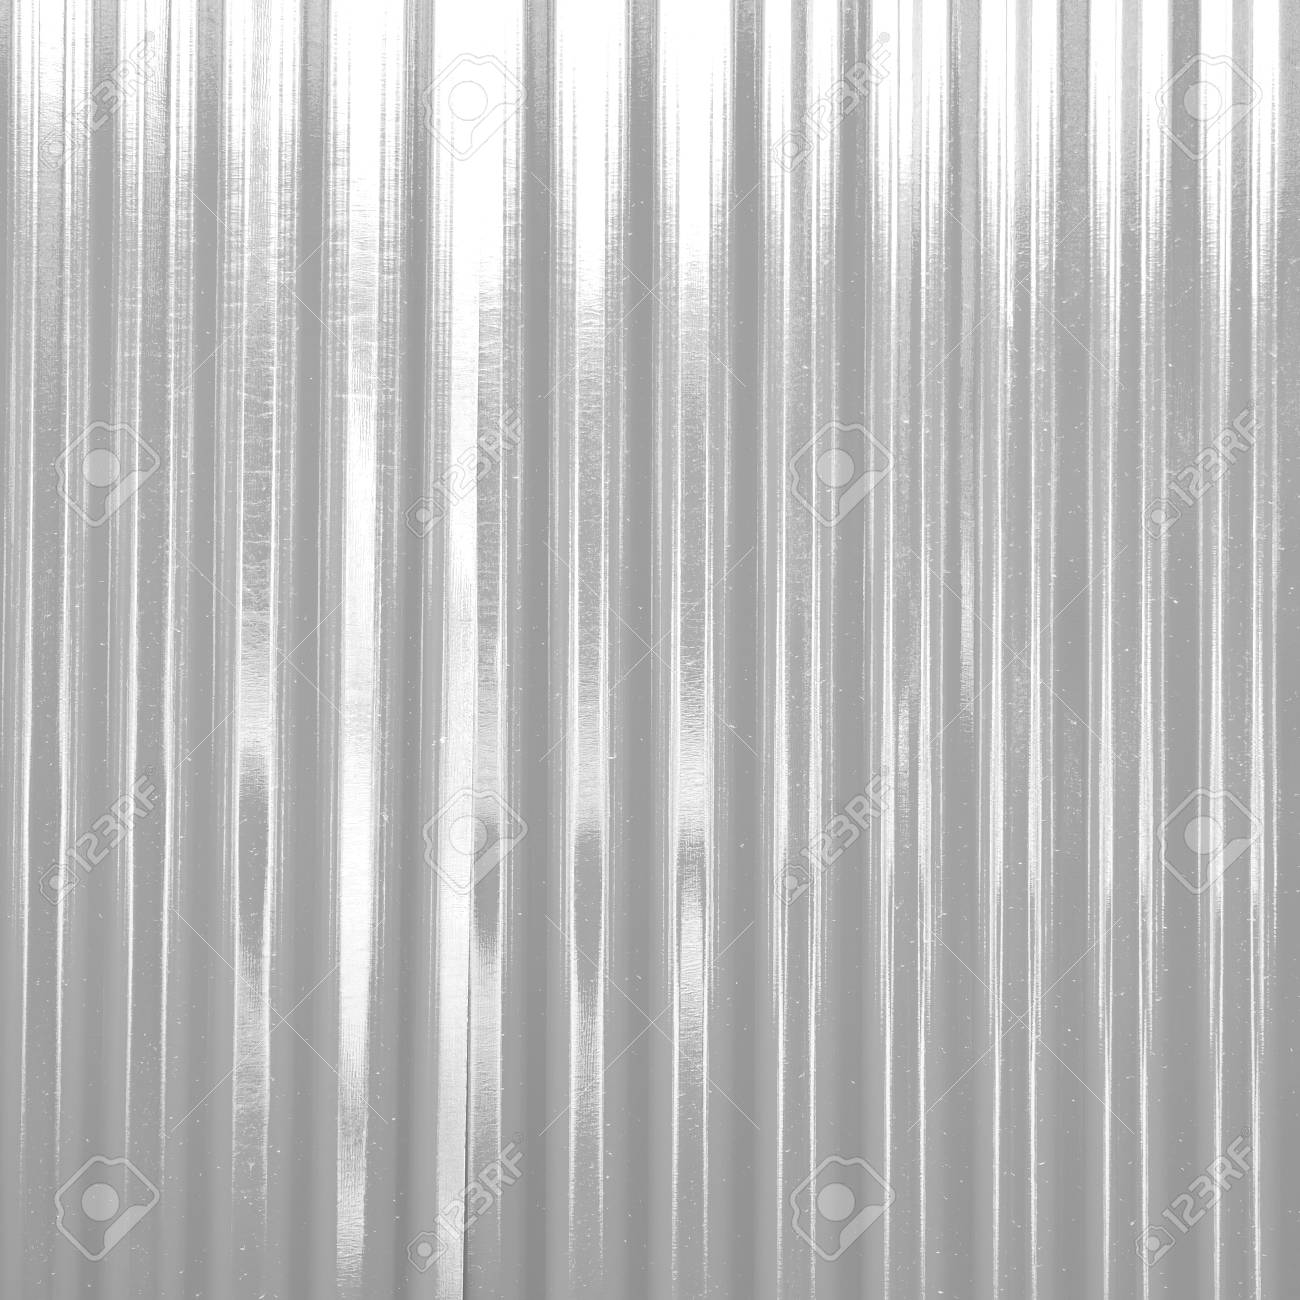 Background of white metal Stock Photo - 20576560